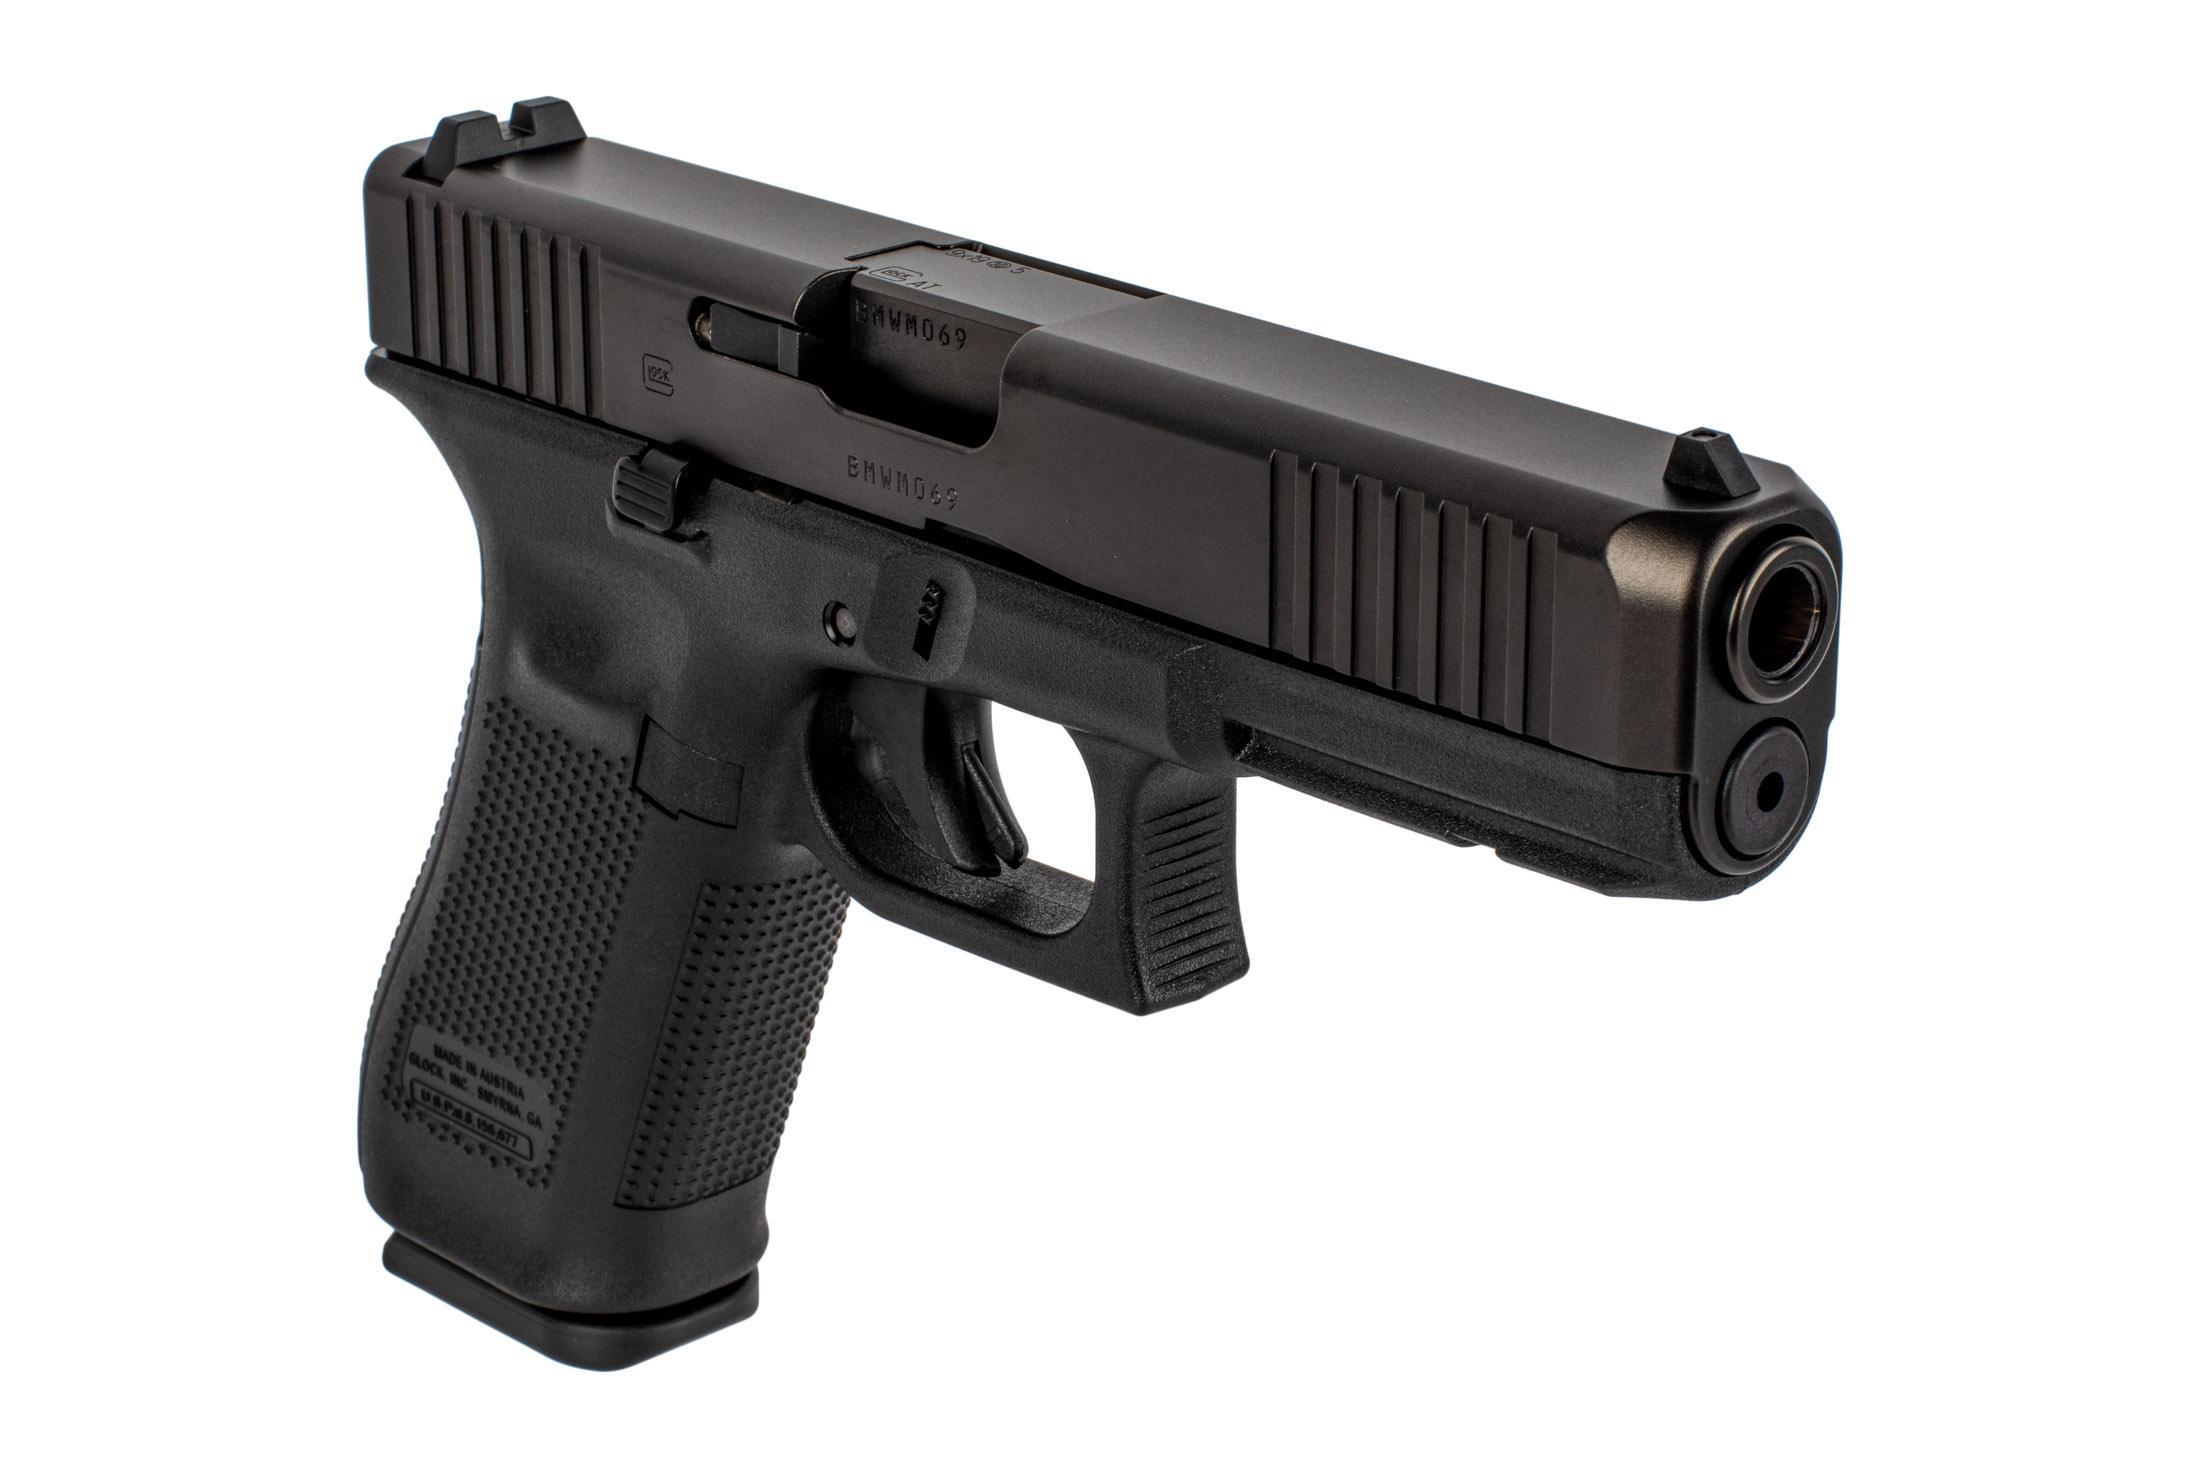 Glock 17 Gen 5 9mm Full Size Pistol 17 Round - Front Slide ...